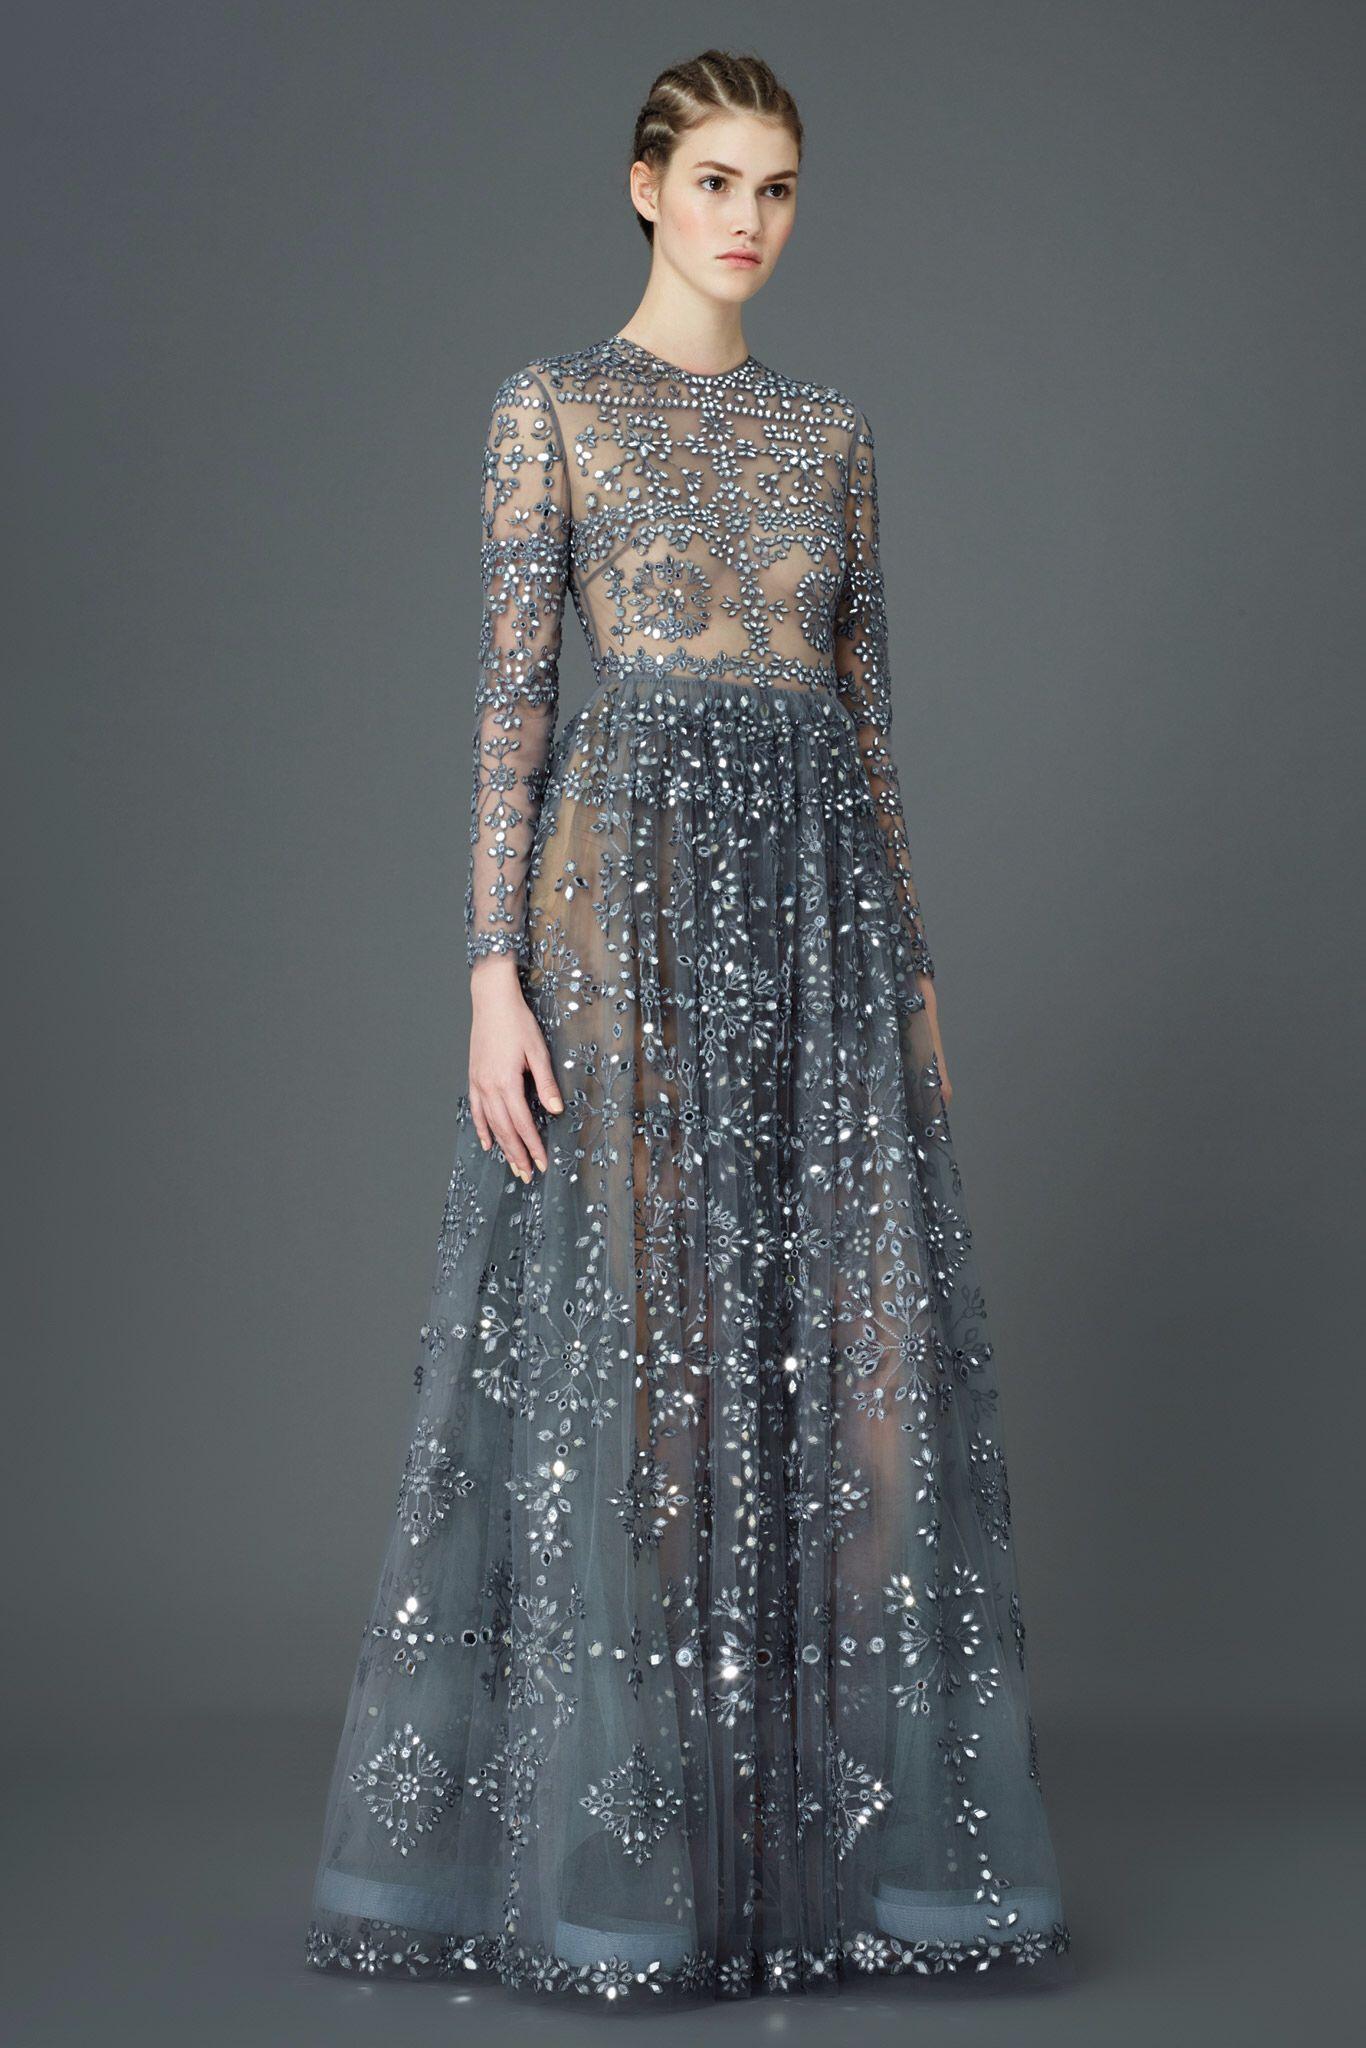 15 Genial Valentino Abendkleid SpezialgebietDesigner Spektakulär Valentino Abendkleid Galerie